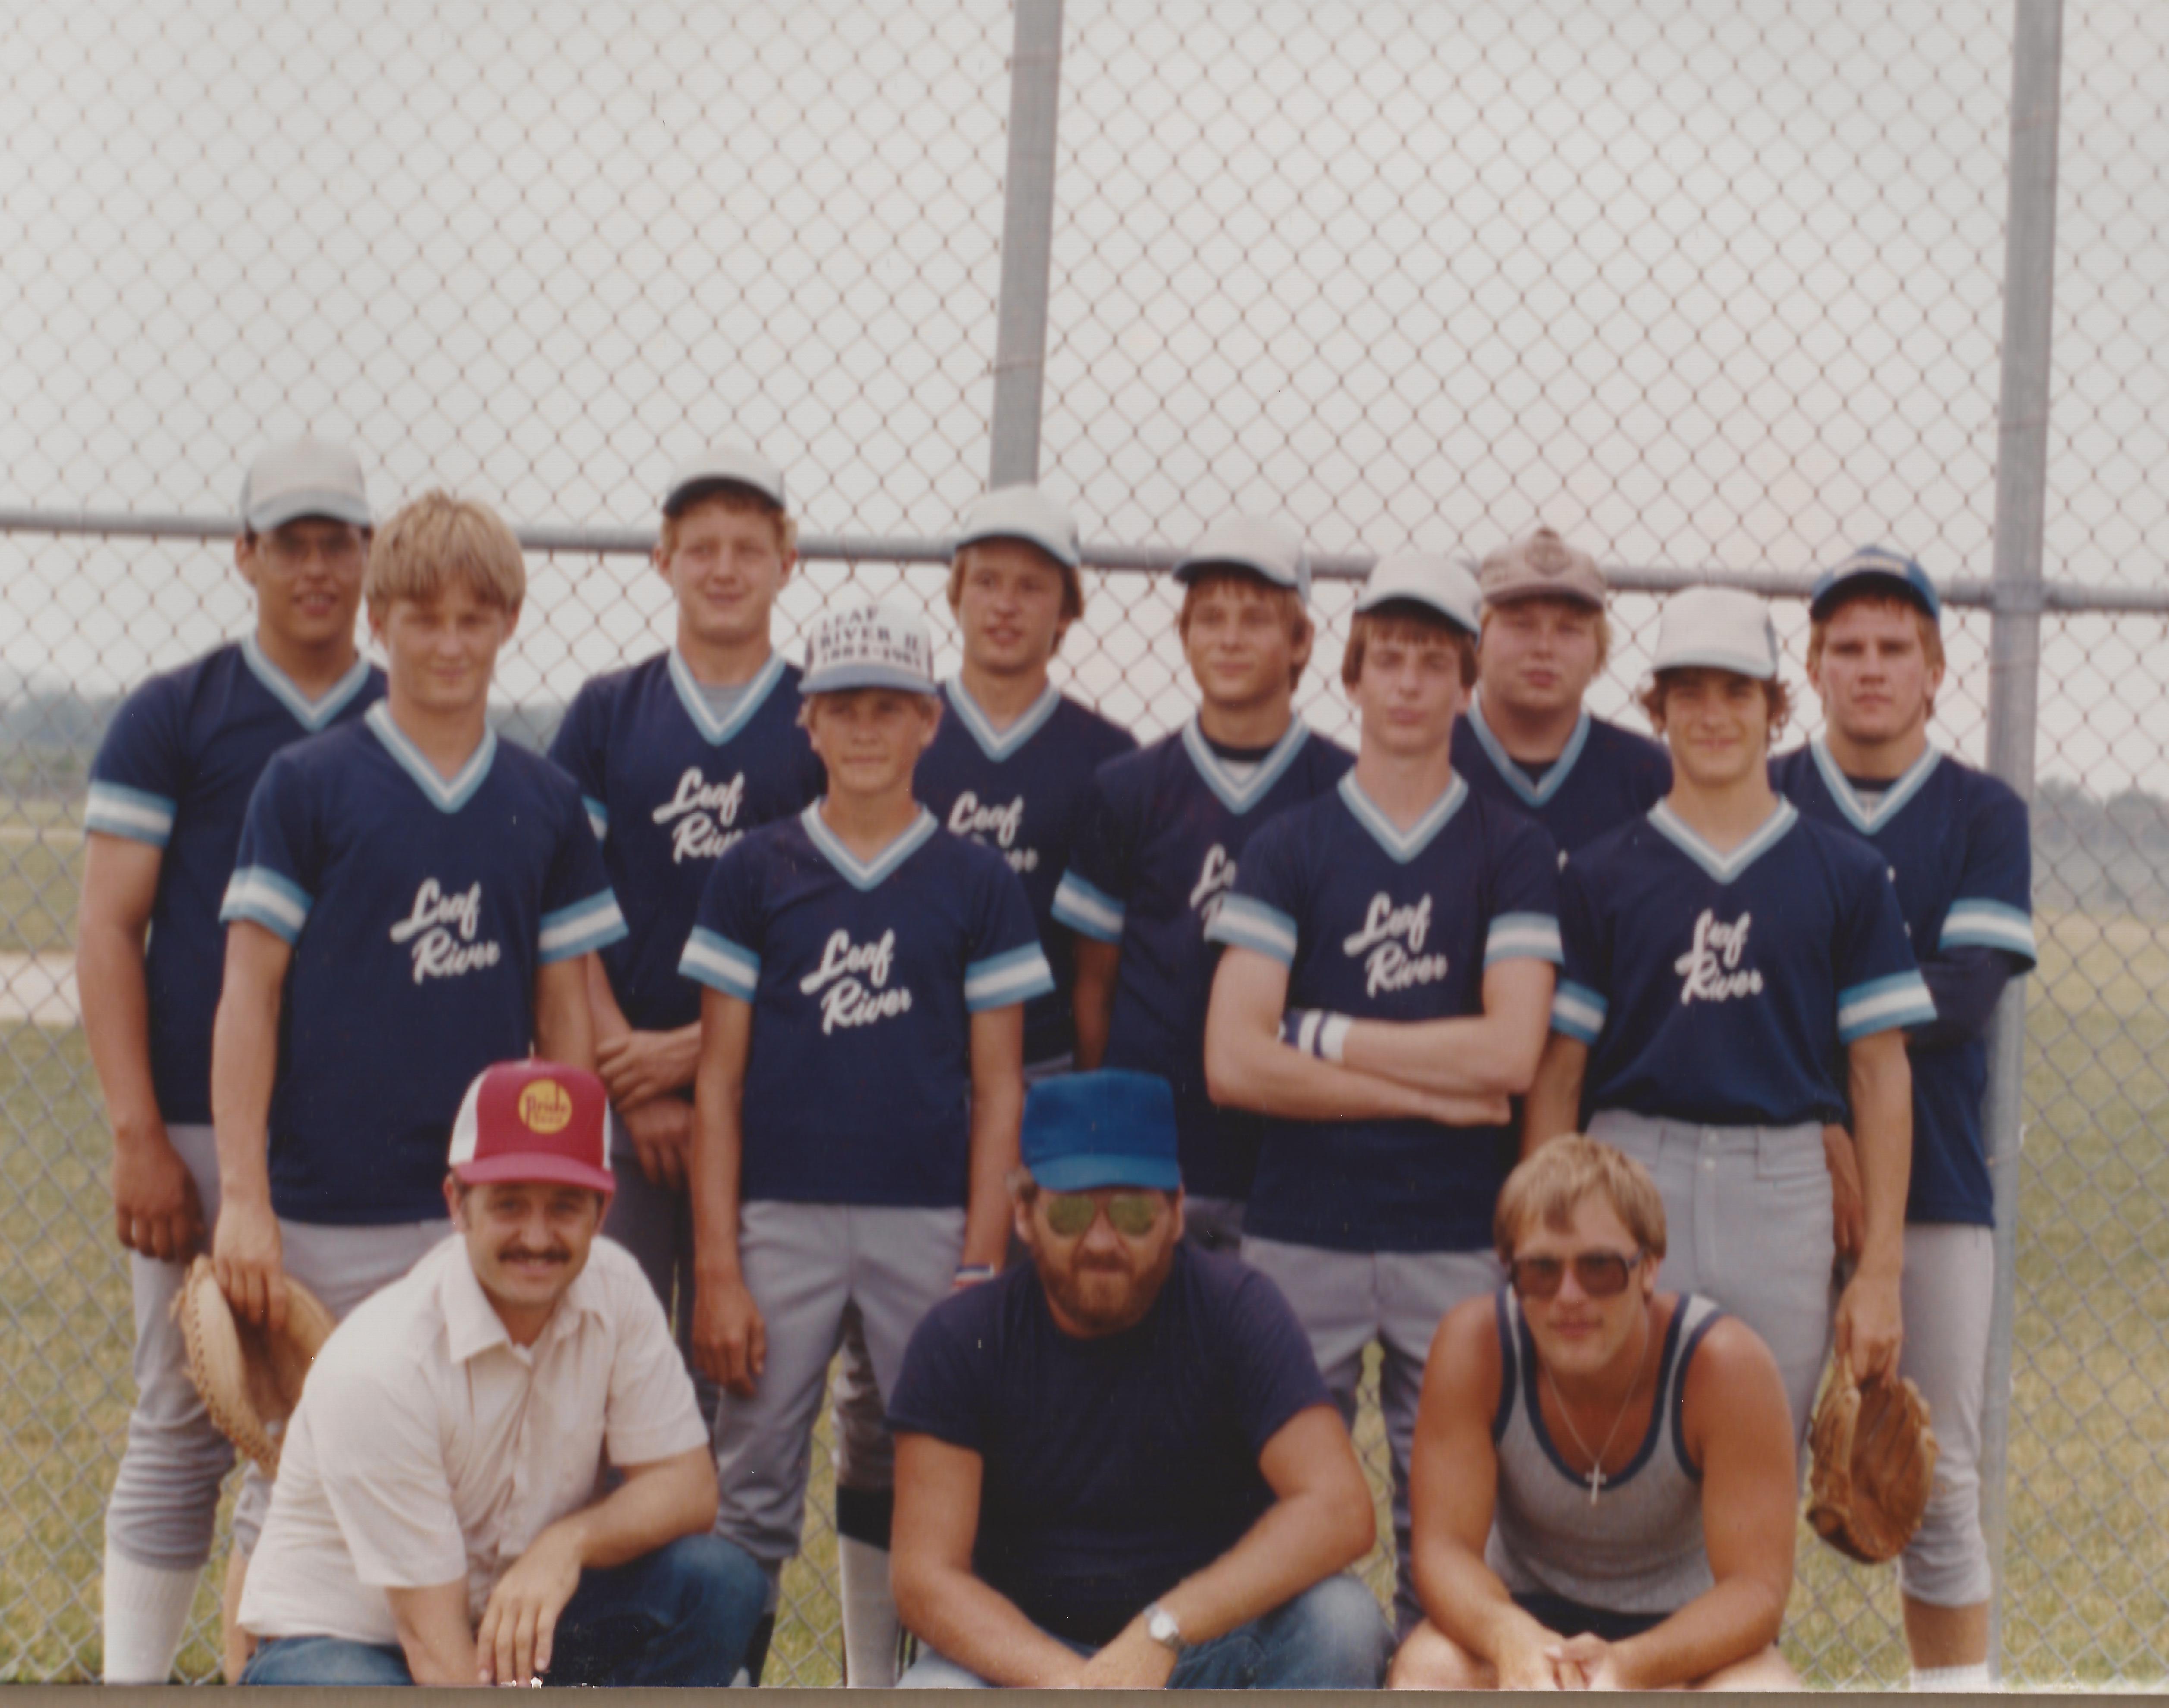 1984 LR Baseball Team